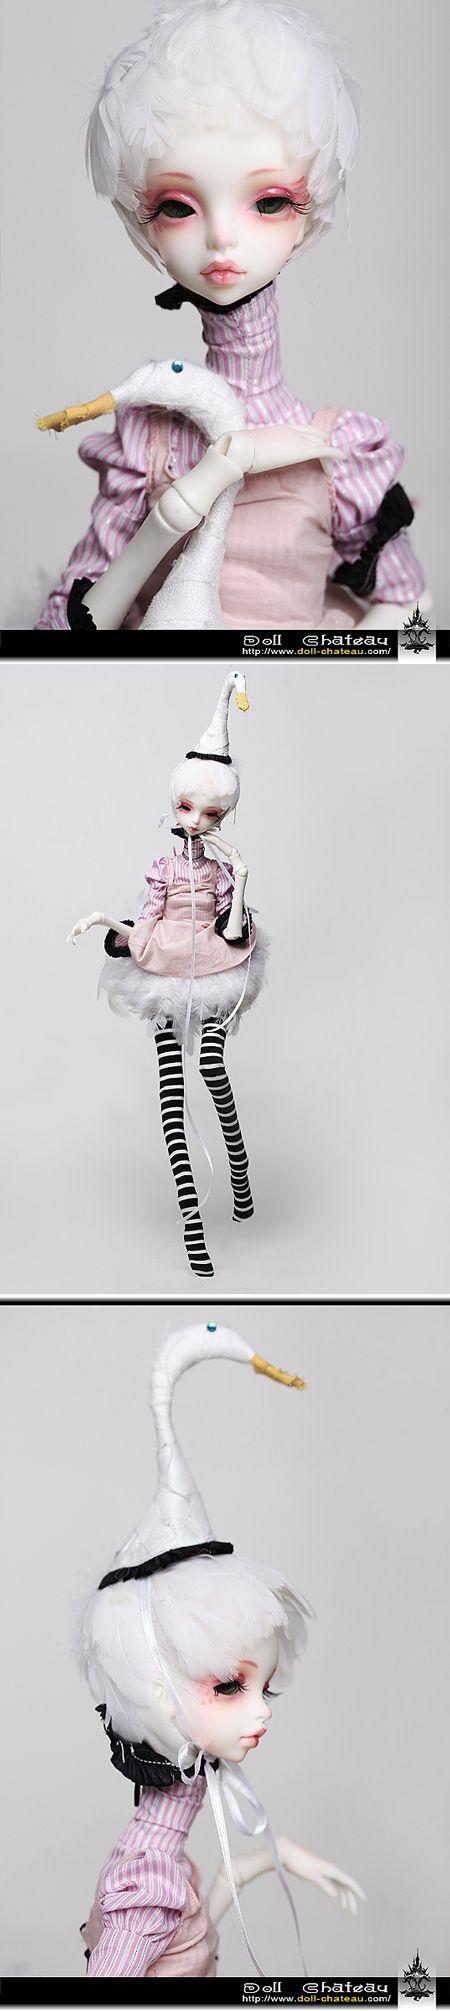 Queena - Denver Doll Emporium